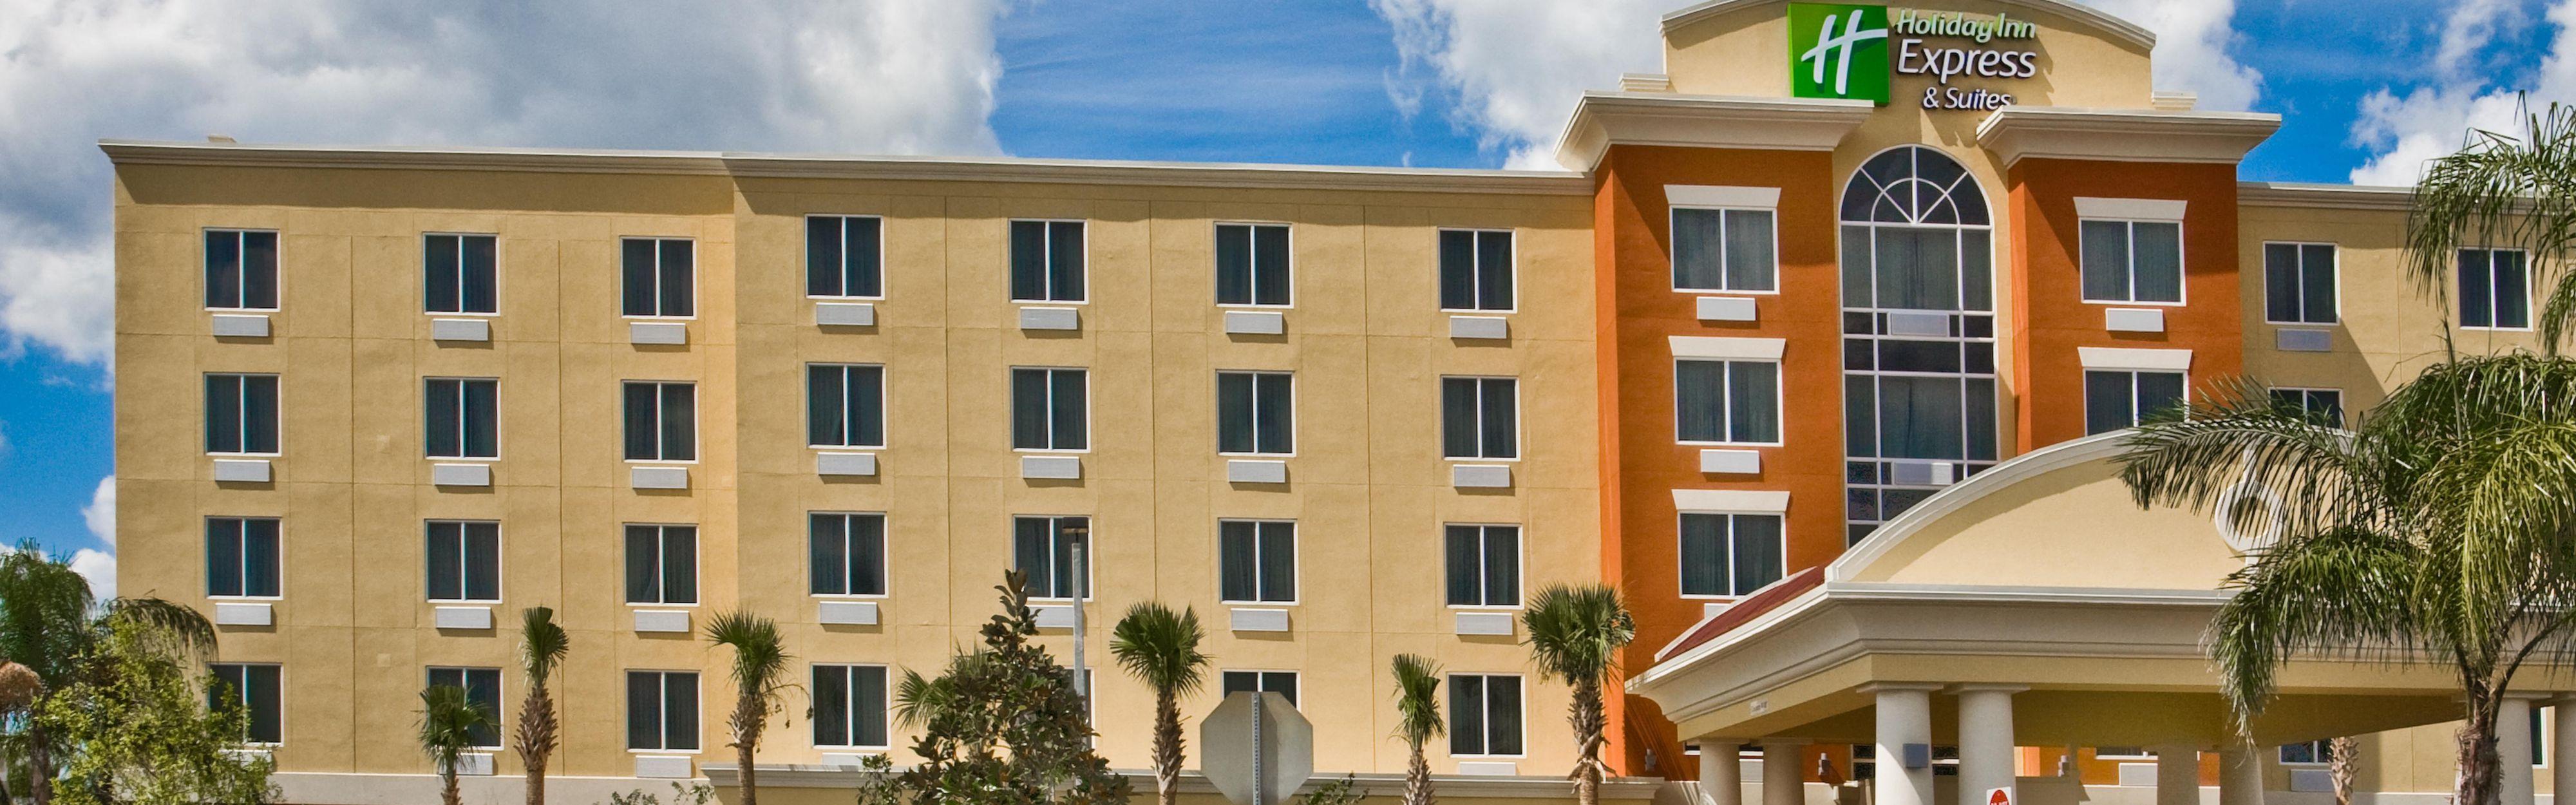 Port St Lucie Motels Hotels